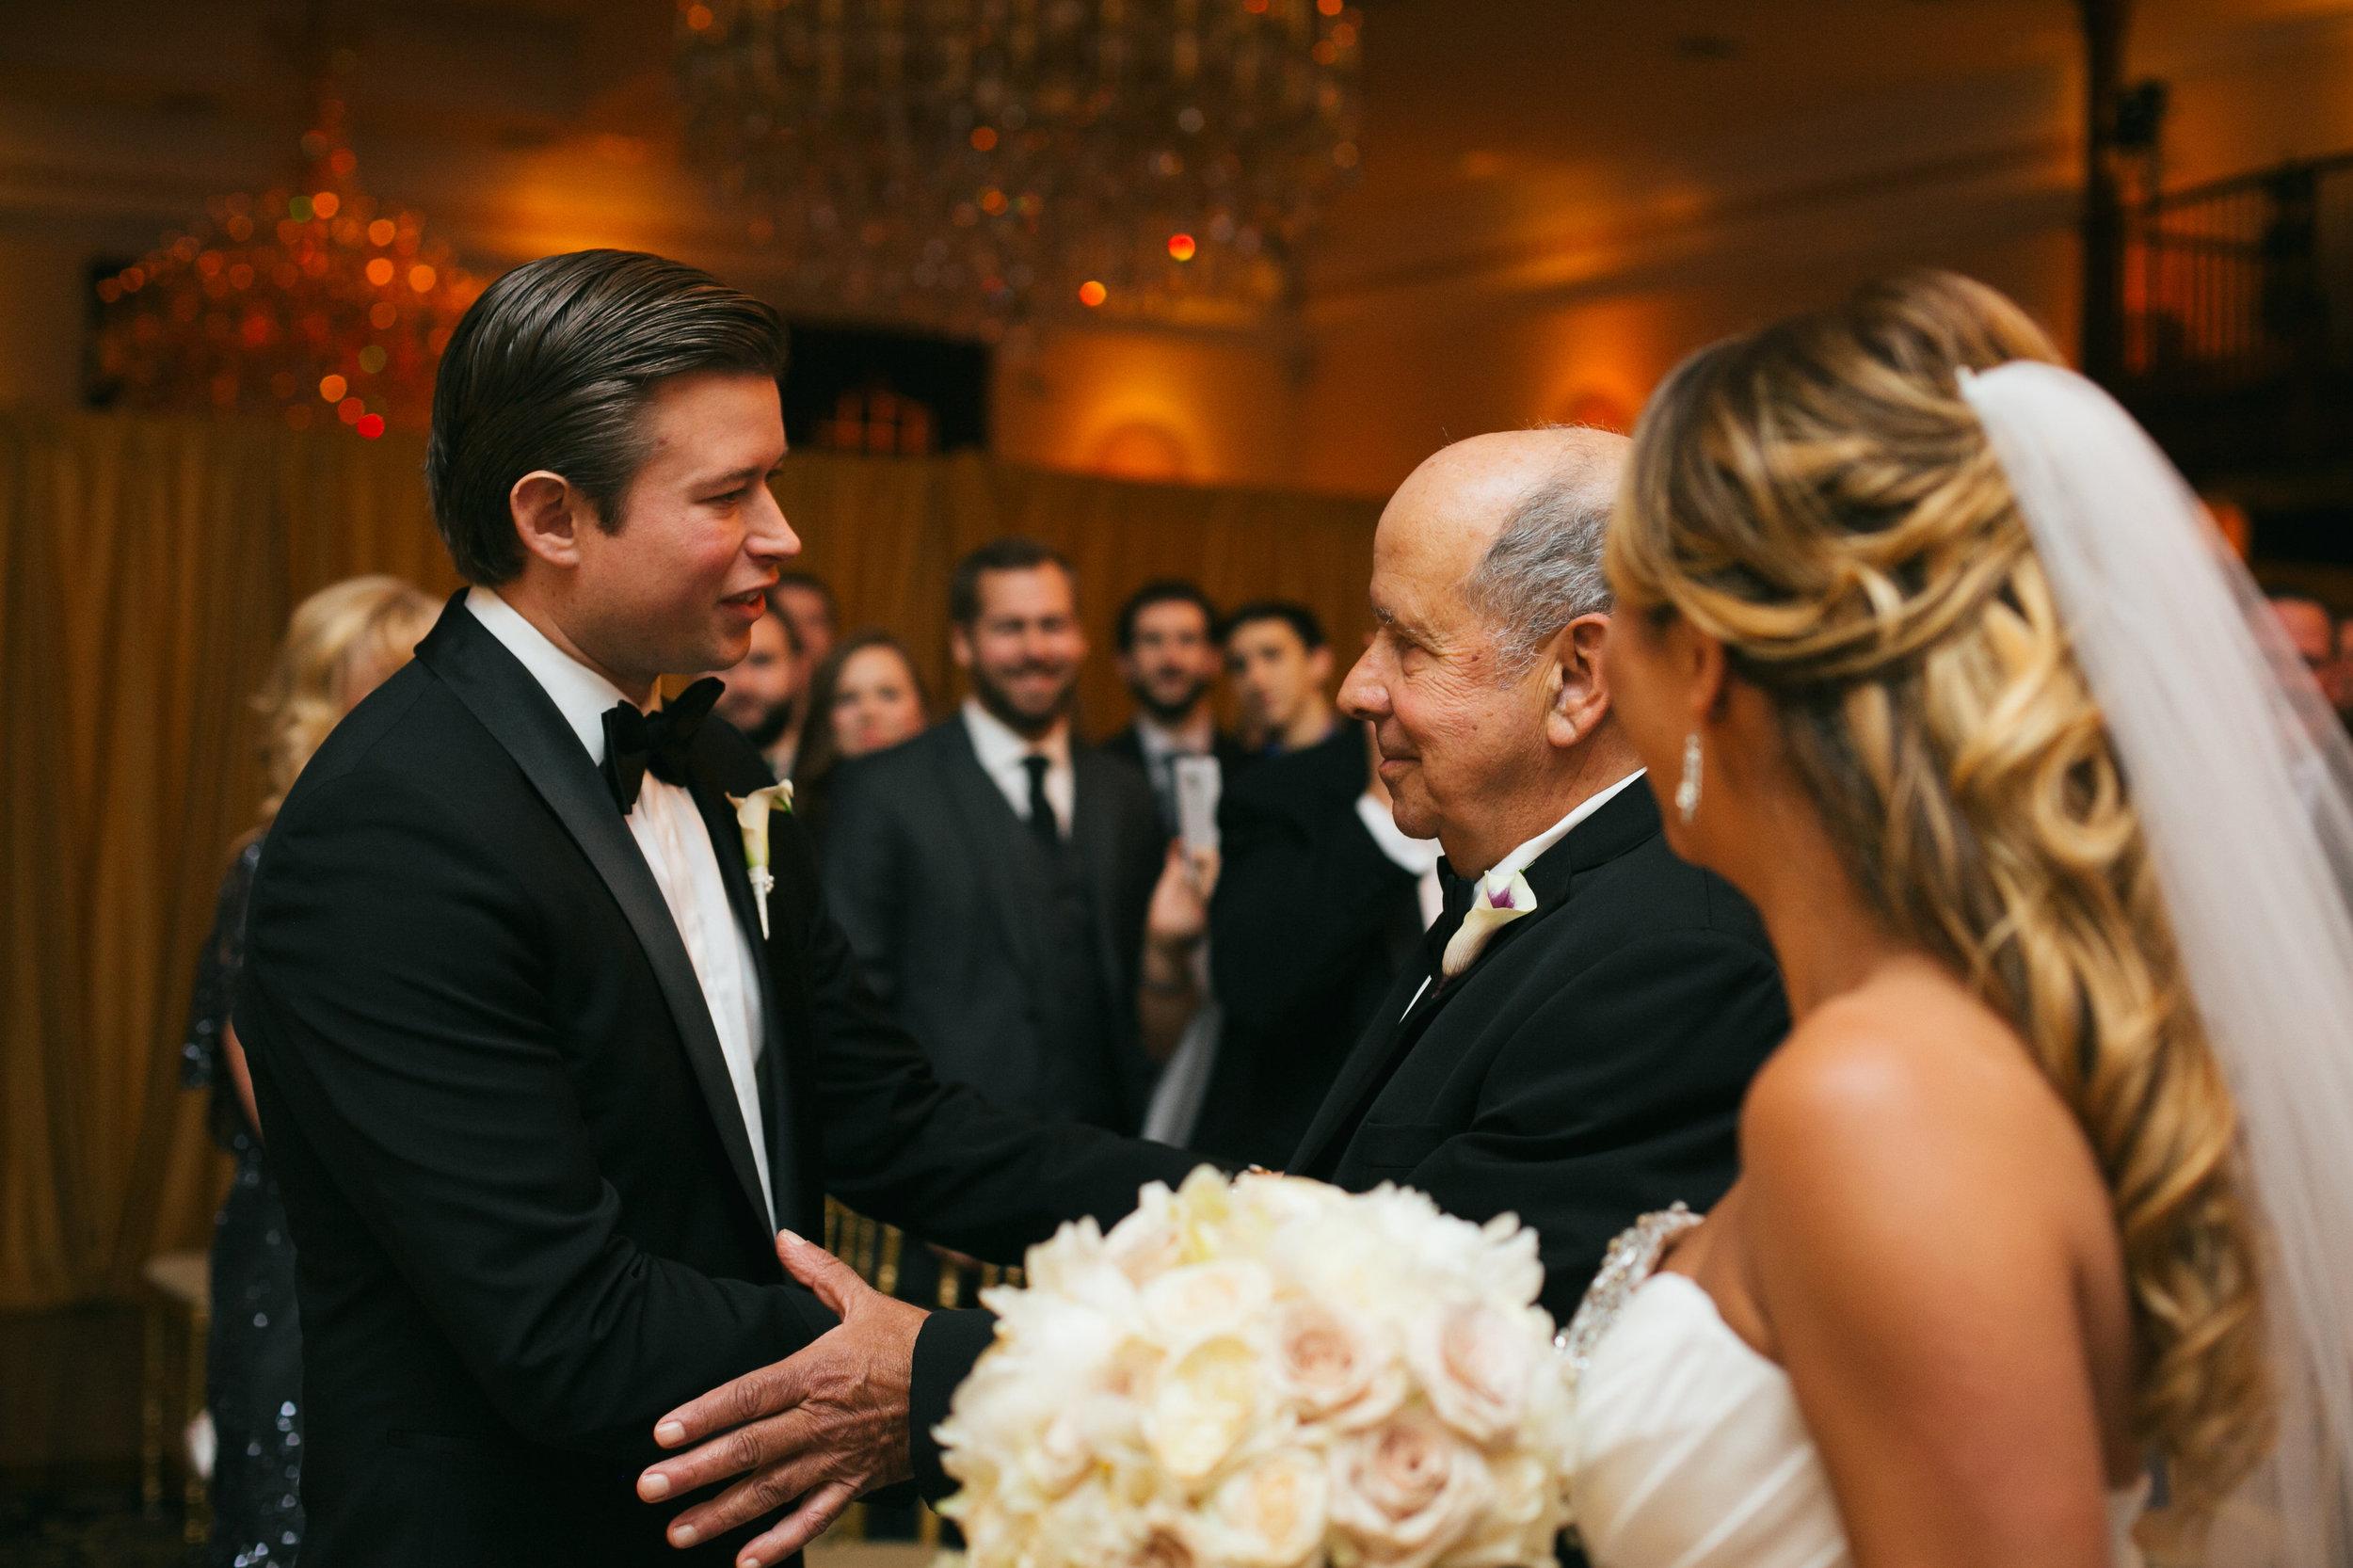 Ceci_New_York_Custom_Invitation_ New_Jersey_Wedding_Luxury_Personalized_Ceci_Style_Bride_Foil_Stamping44.jpg